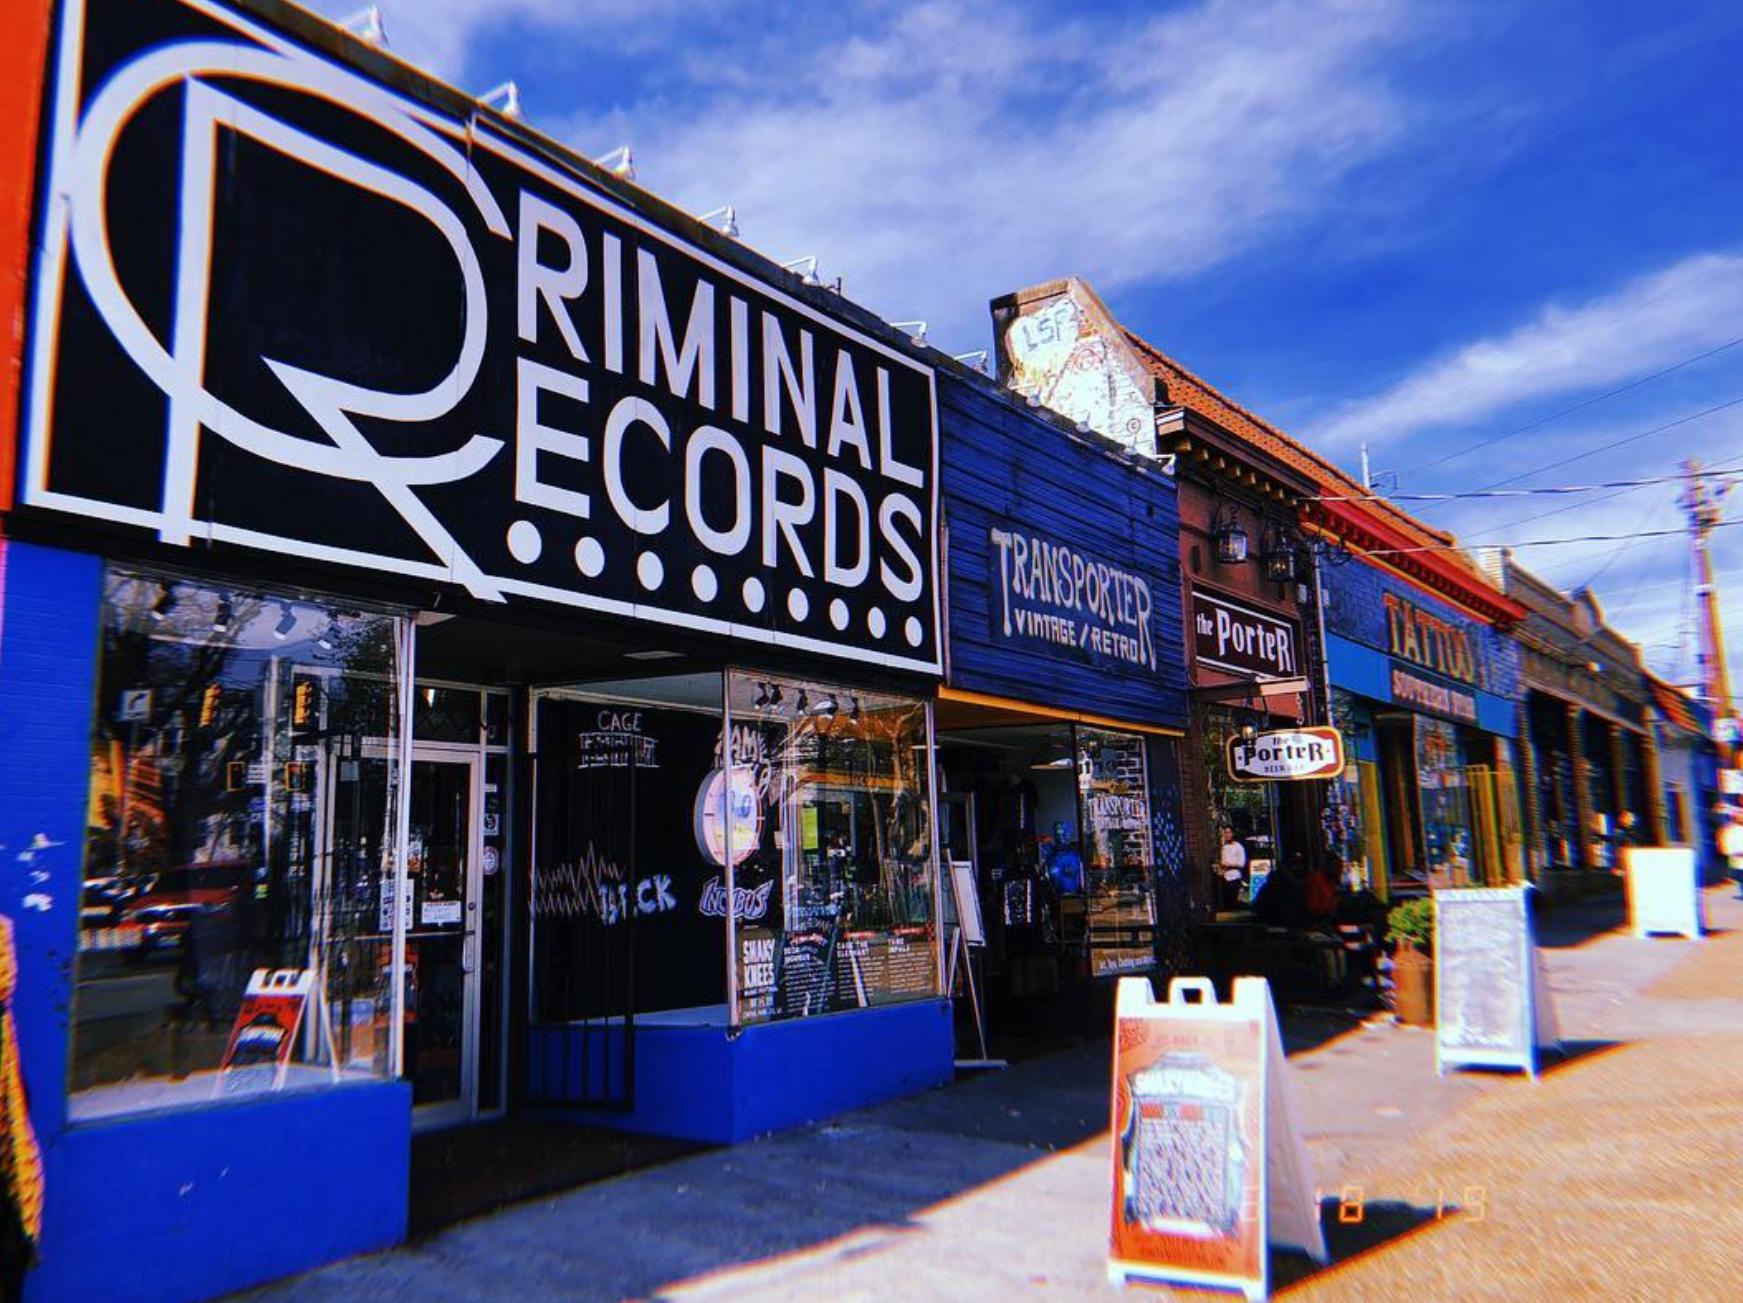 a photo of Criminal Records